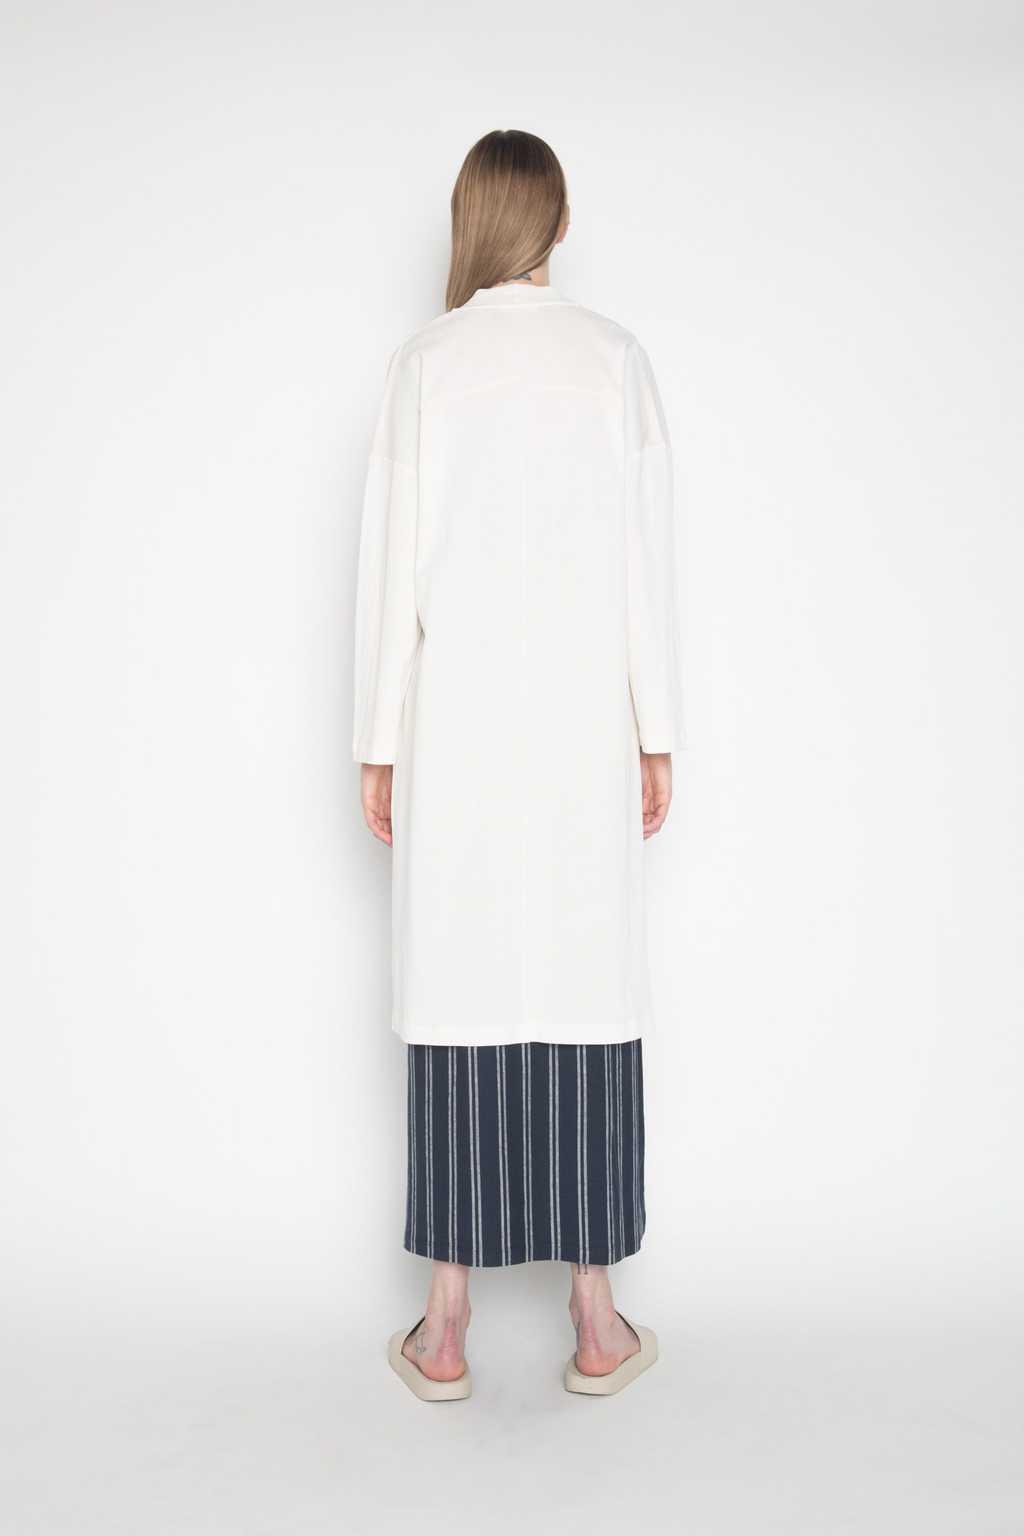 Cardigan 1795 White 6